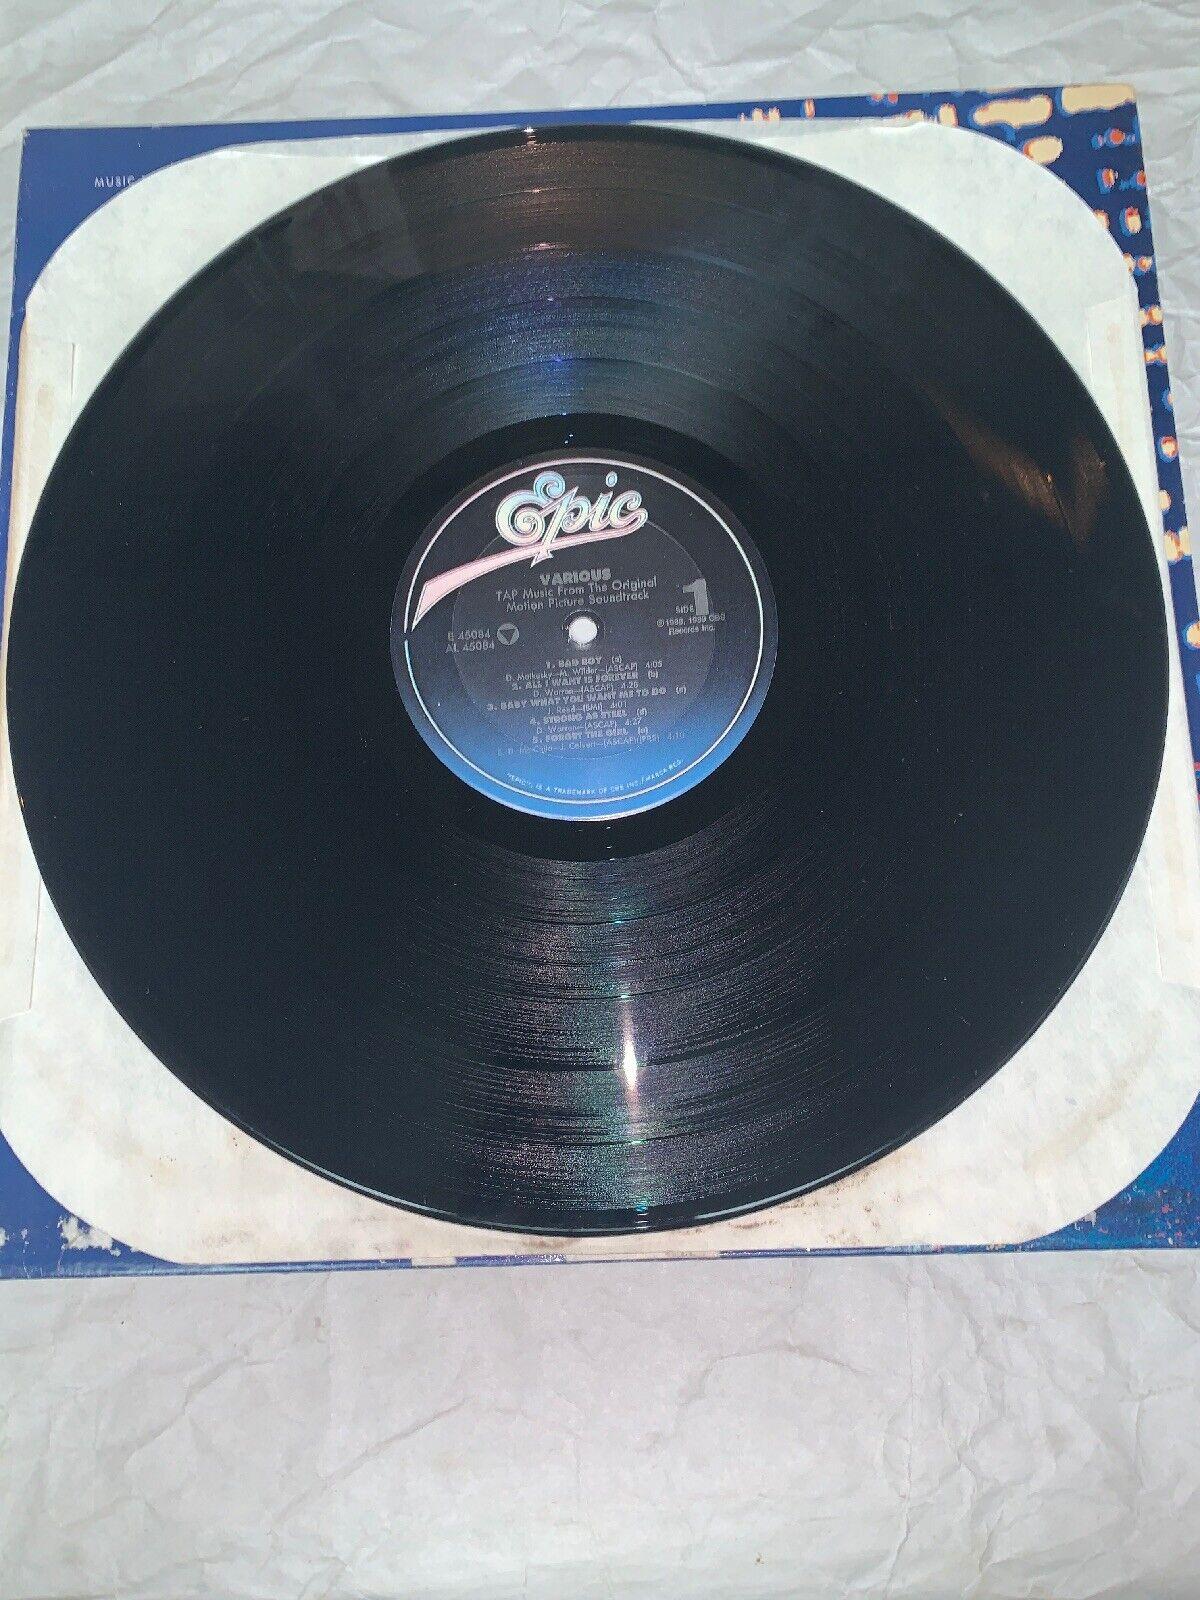 Shrek Music From The Various Artists Geffen Discs 2 Vinyl For Sale Online Ebay